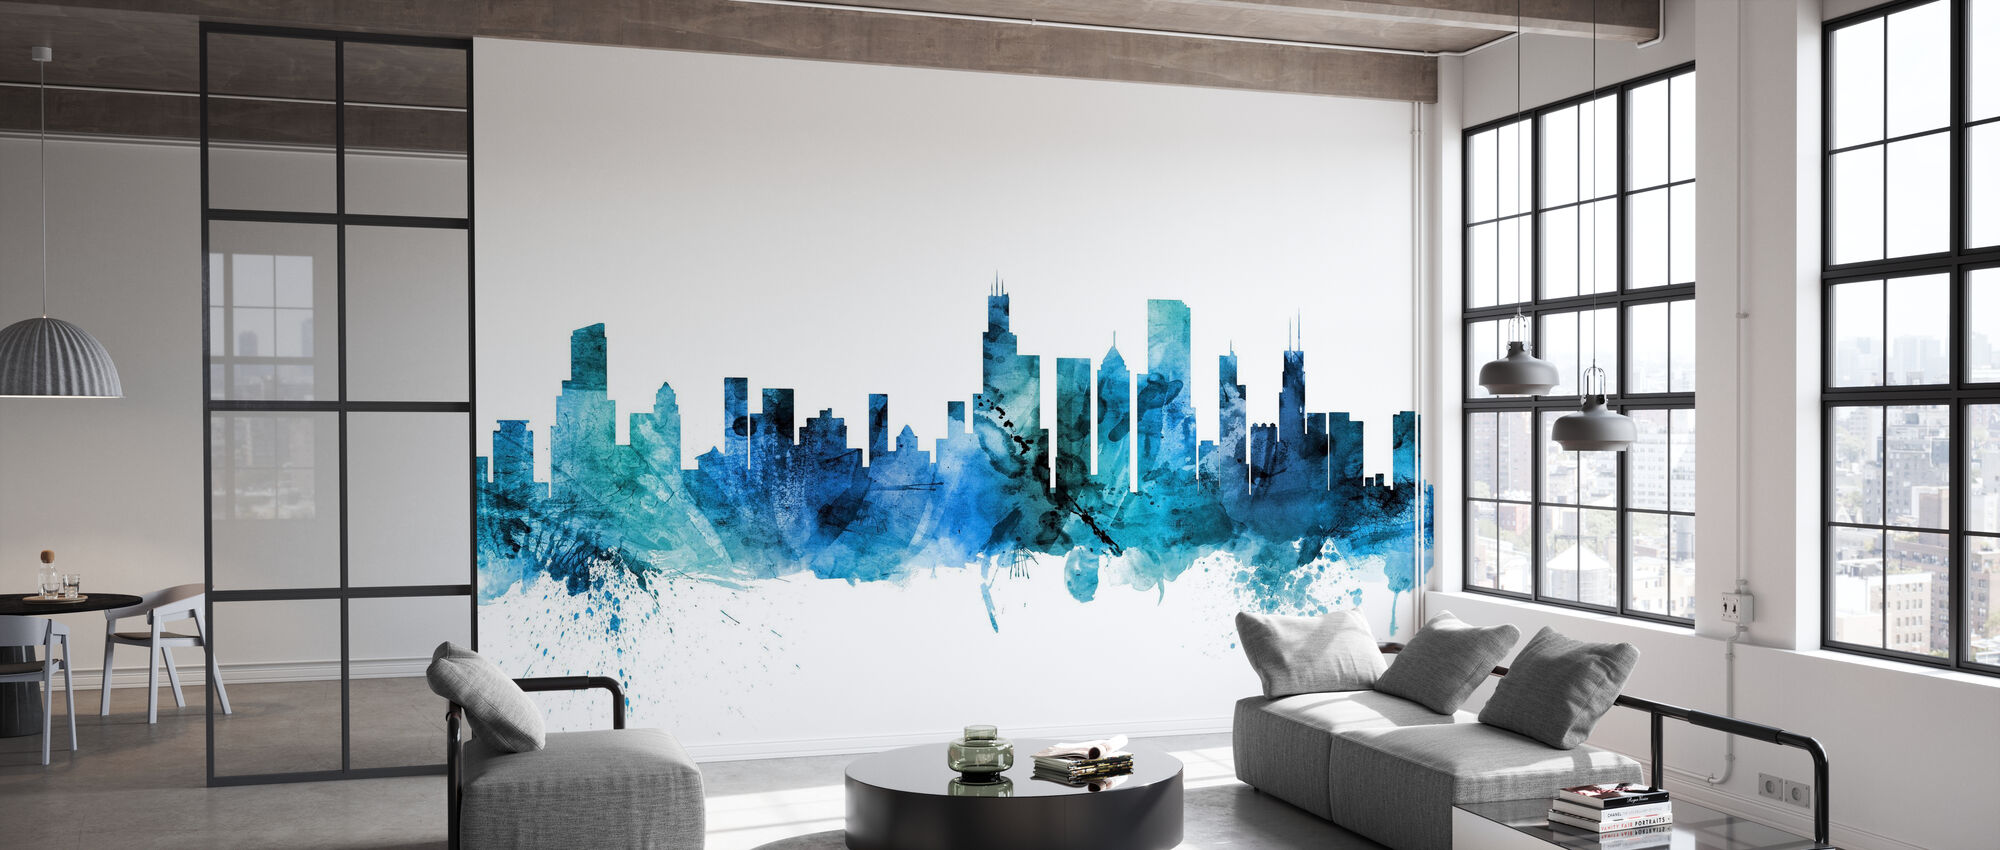 Chicago Illinois Skyline - Behang - Kantoor